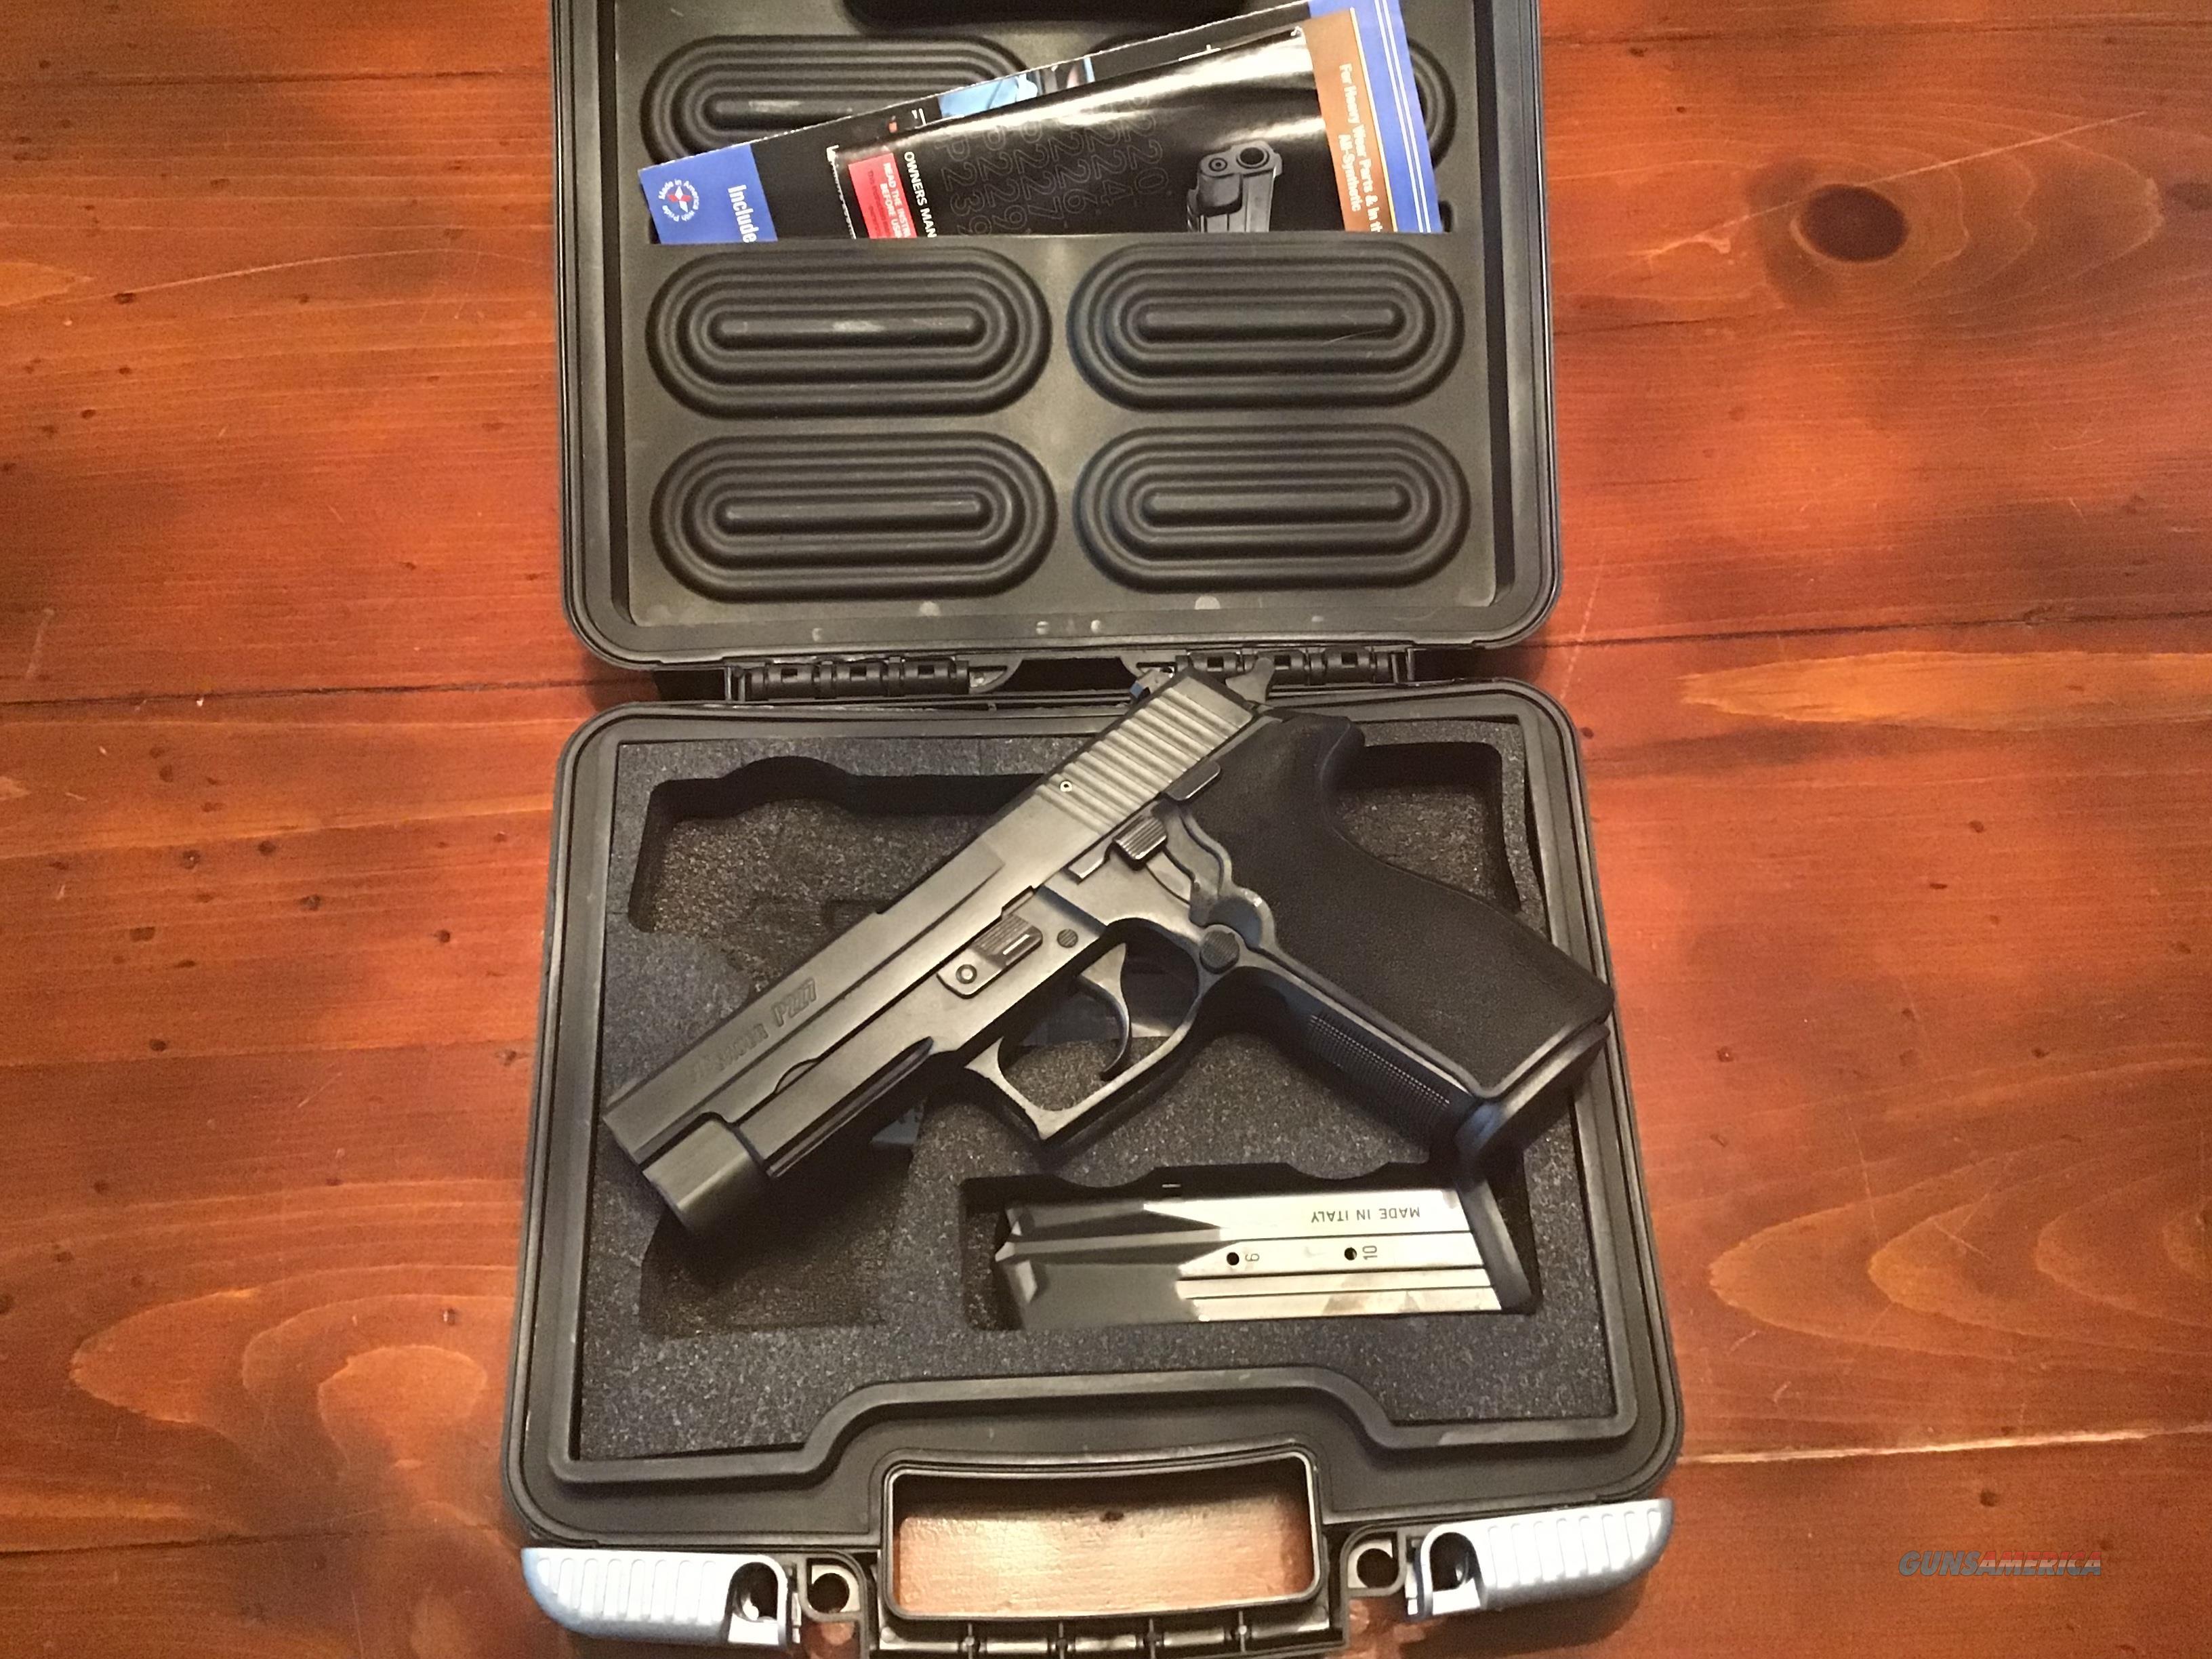 Sig Sauer P227  Guns > Pistols > Sig - Sauer/Sigarms Pistols > P227